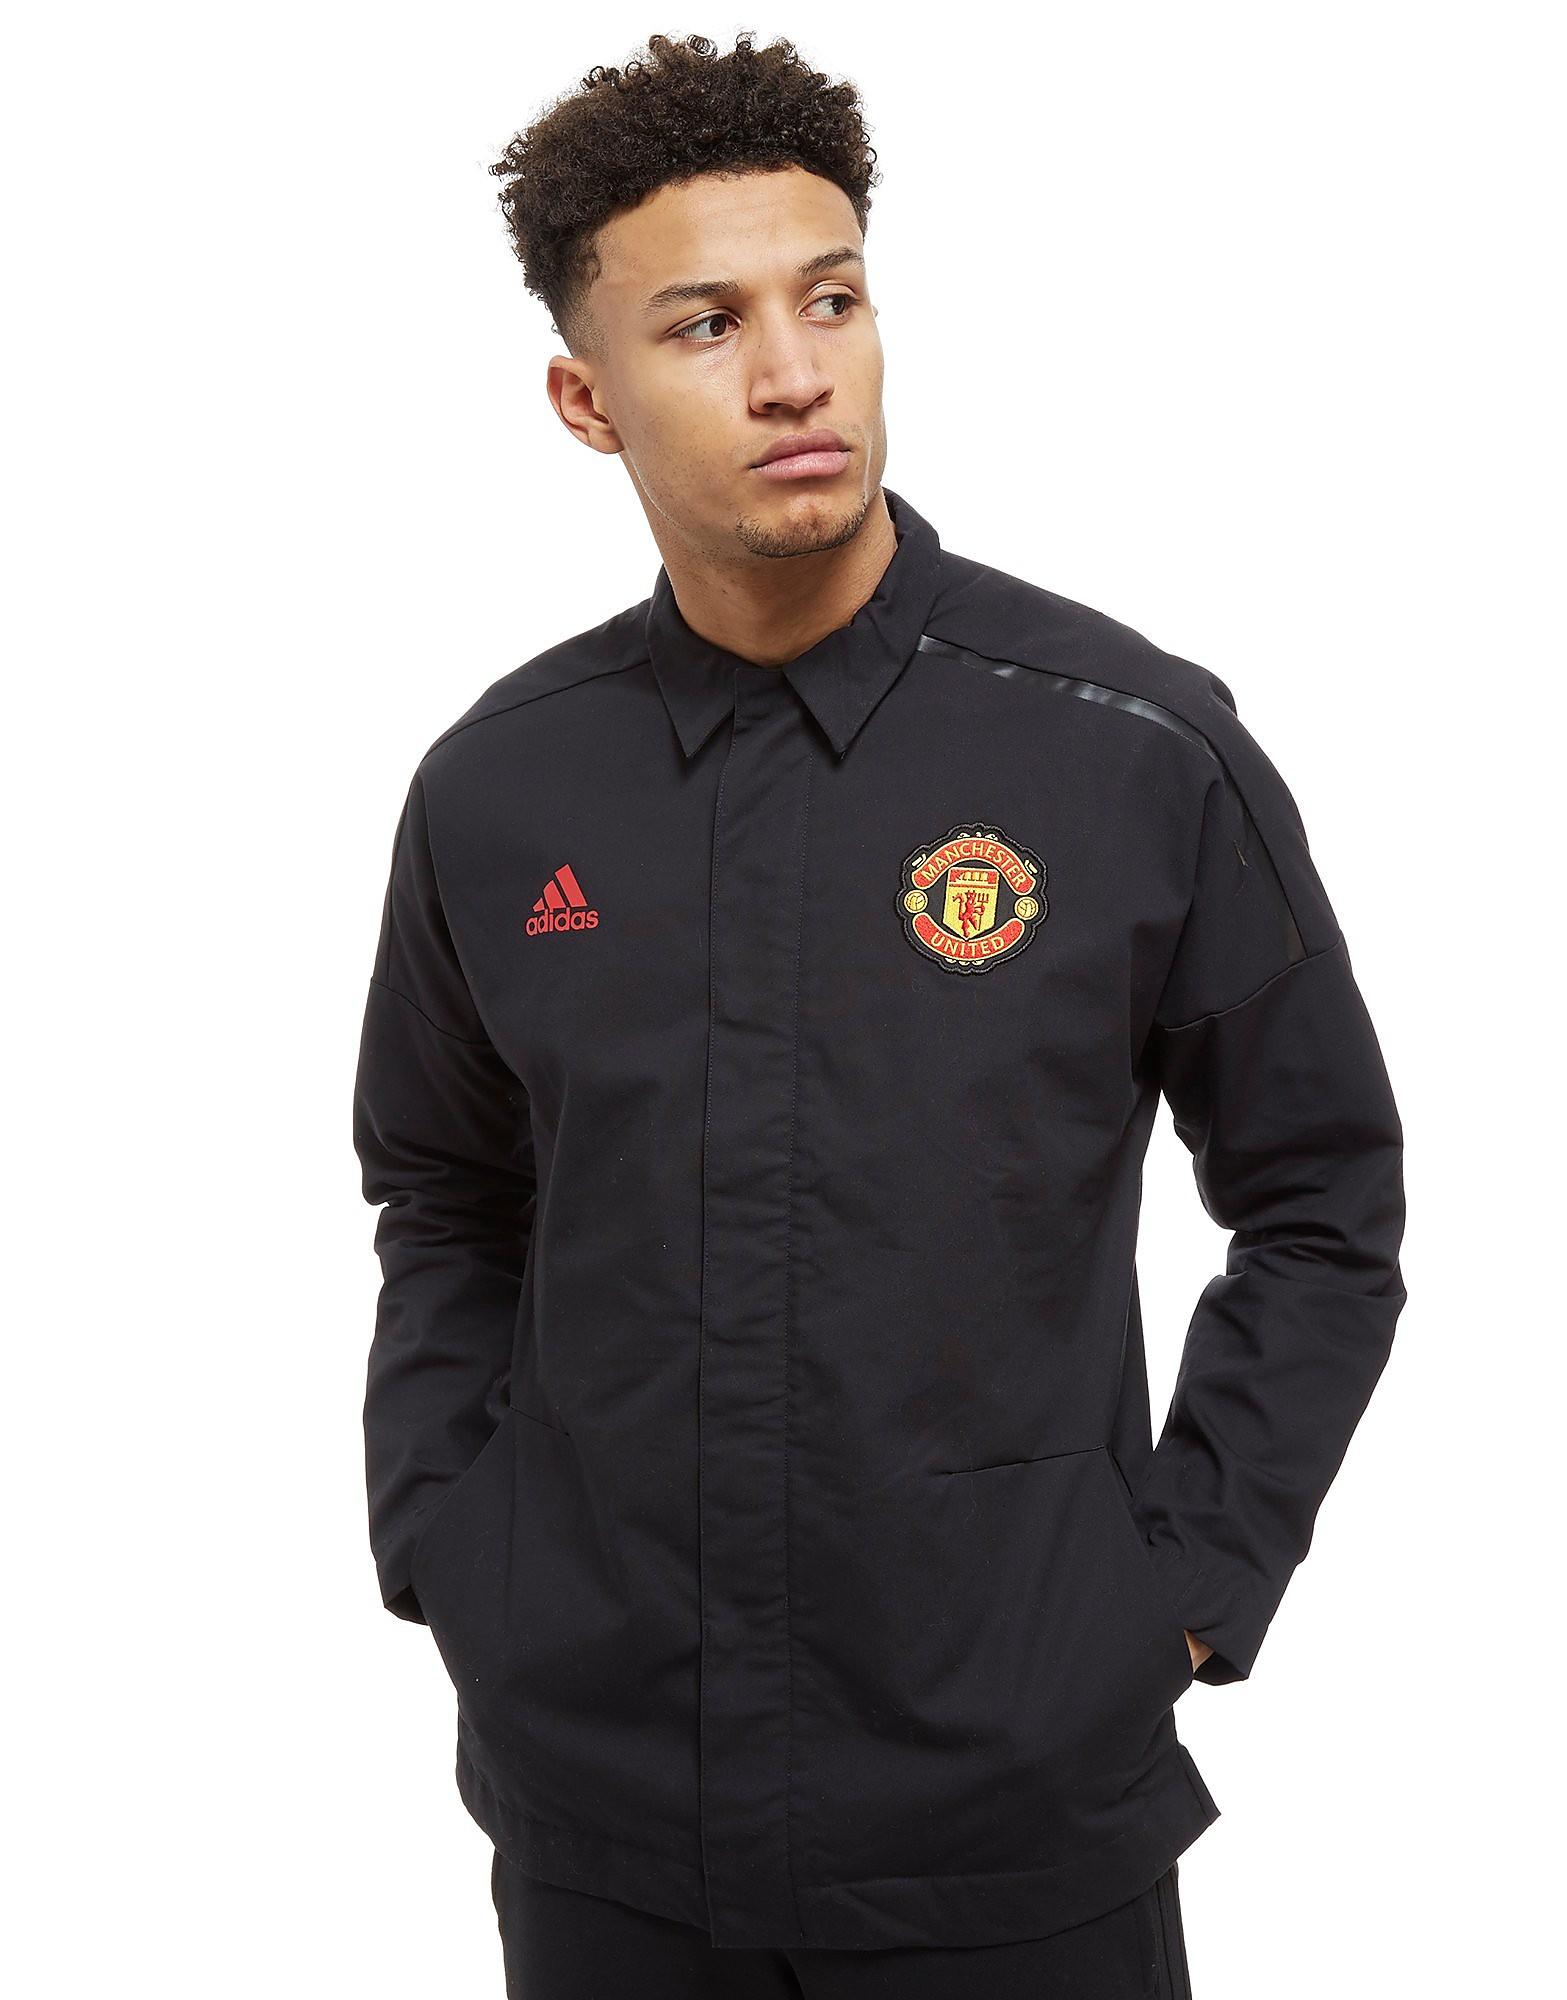 adidas Chemise Manchester United FC 2018 Z.N.E. Homme - Noir, Noir